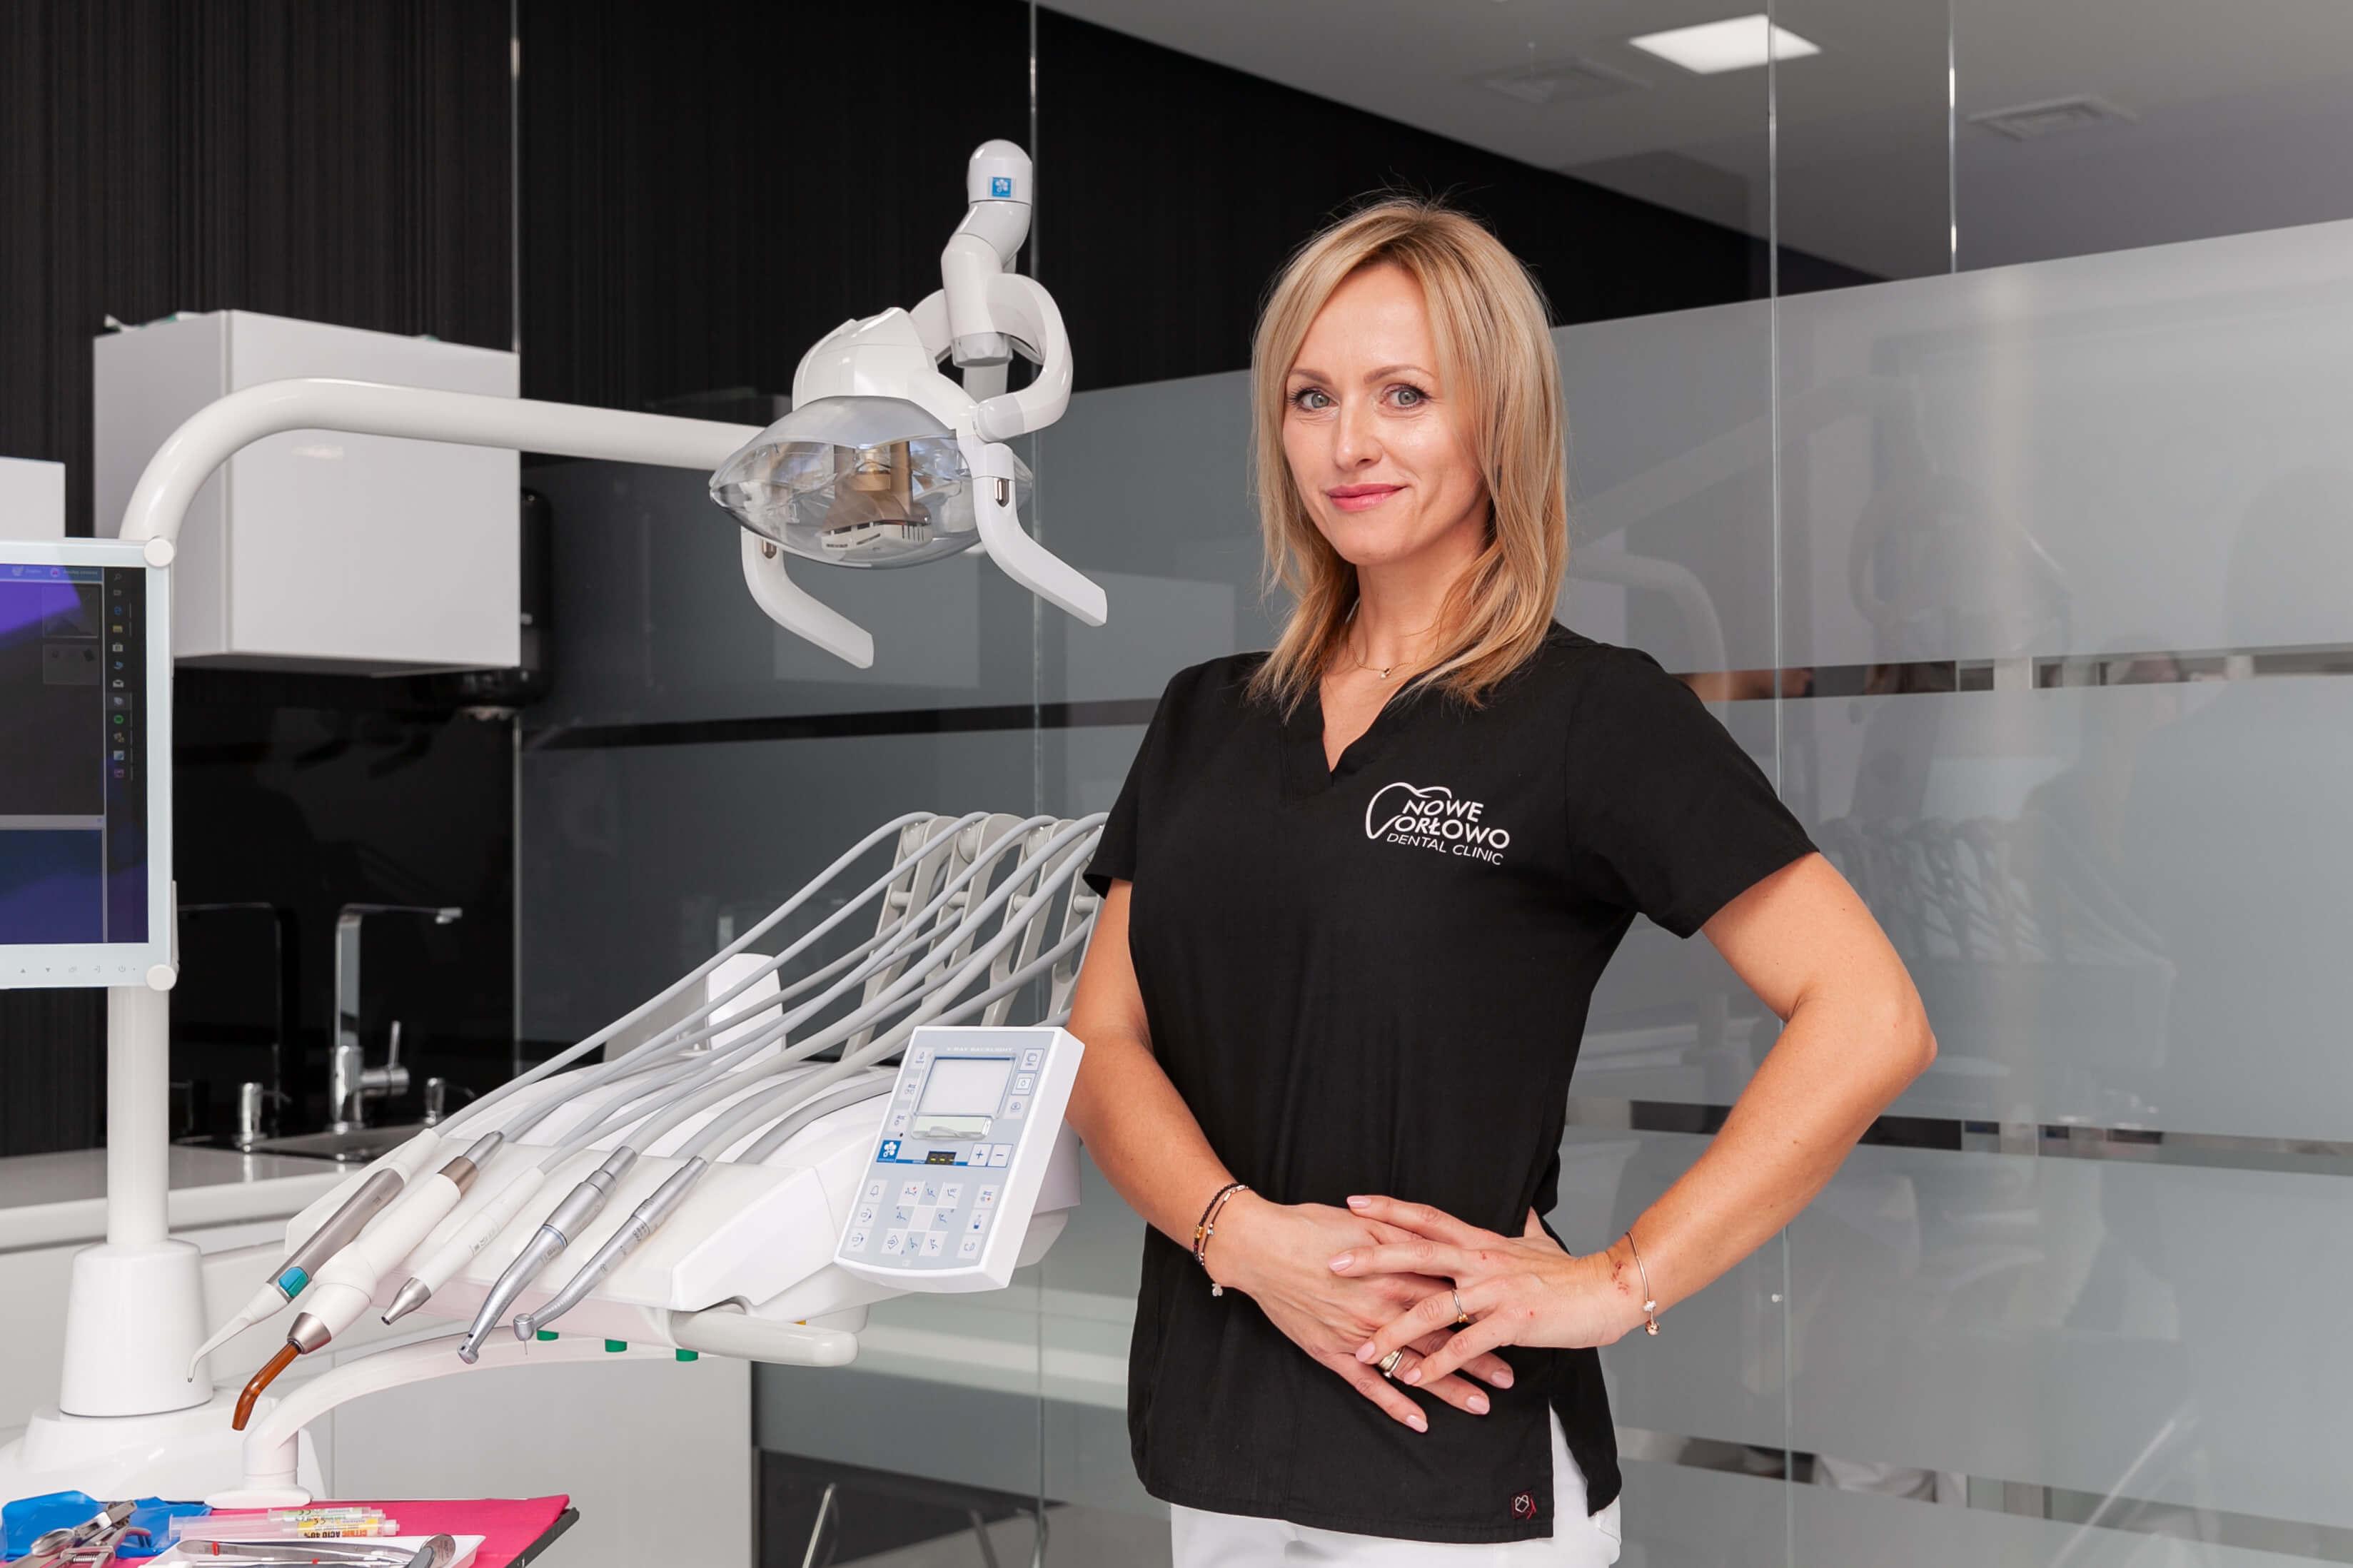 Nowe Orłowo Dental clinic 16 1 - Nowe Orłowo Dental Clinic - a clinic you can trust